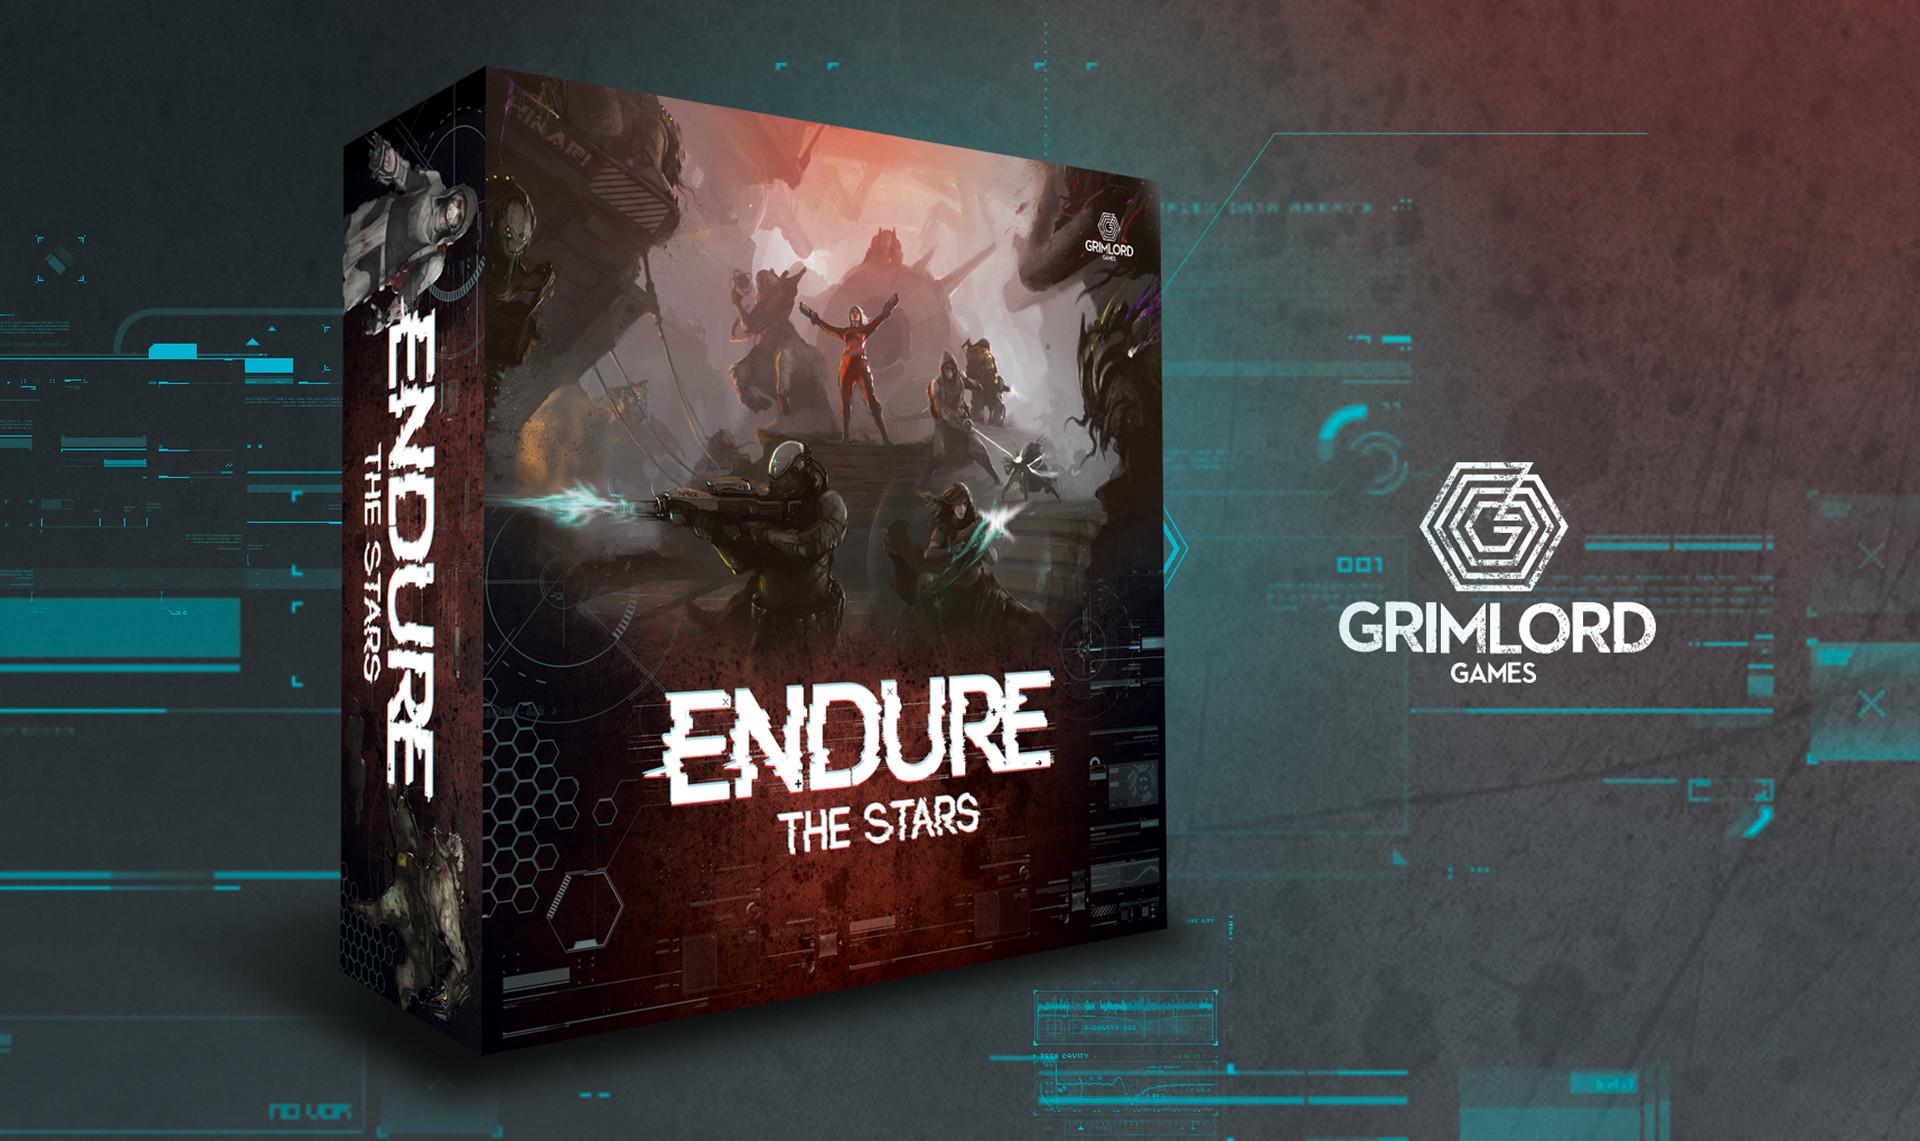 Endure The Stars Board Game Box Design